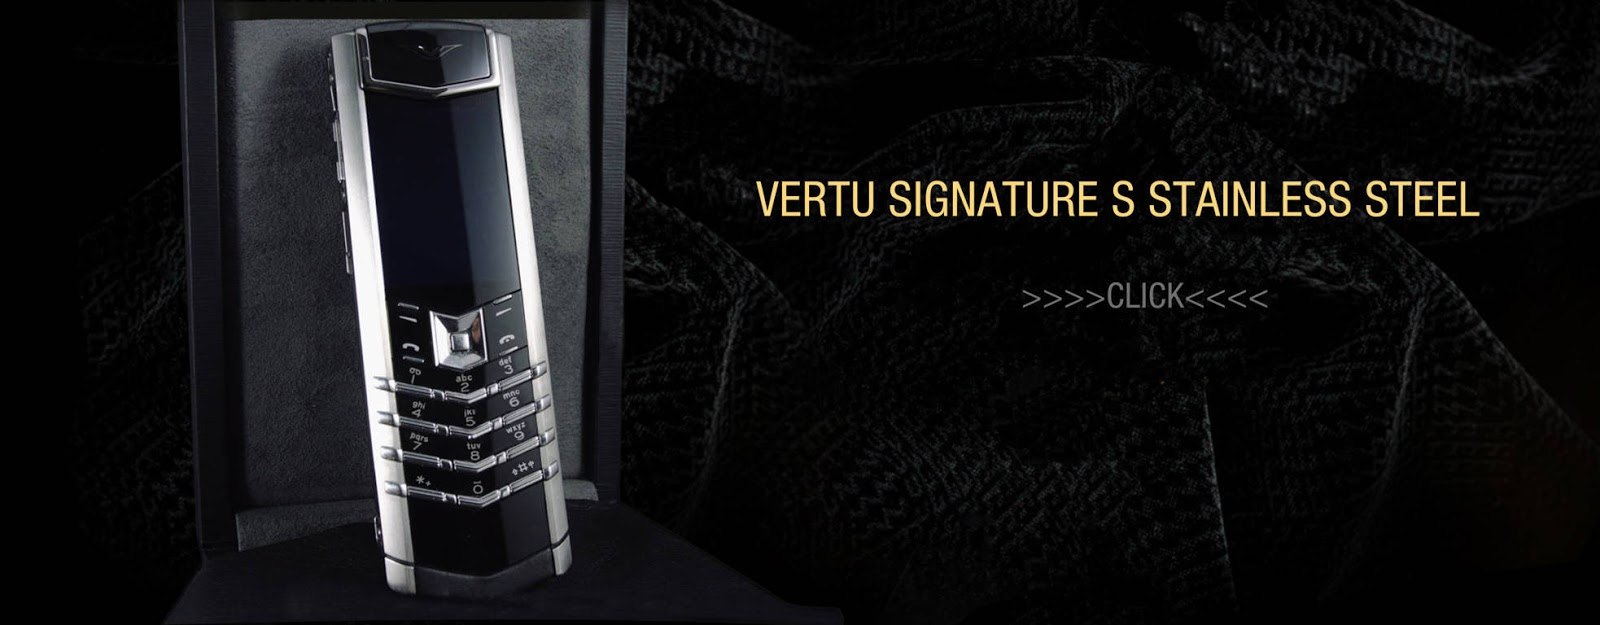 Tổng hợp Vertu Signature S